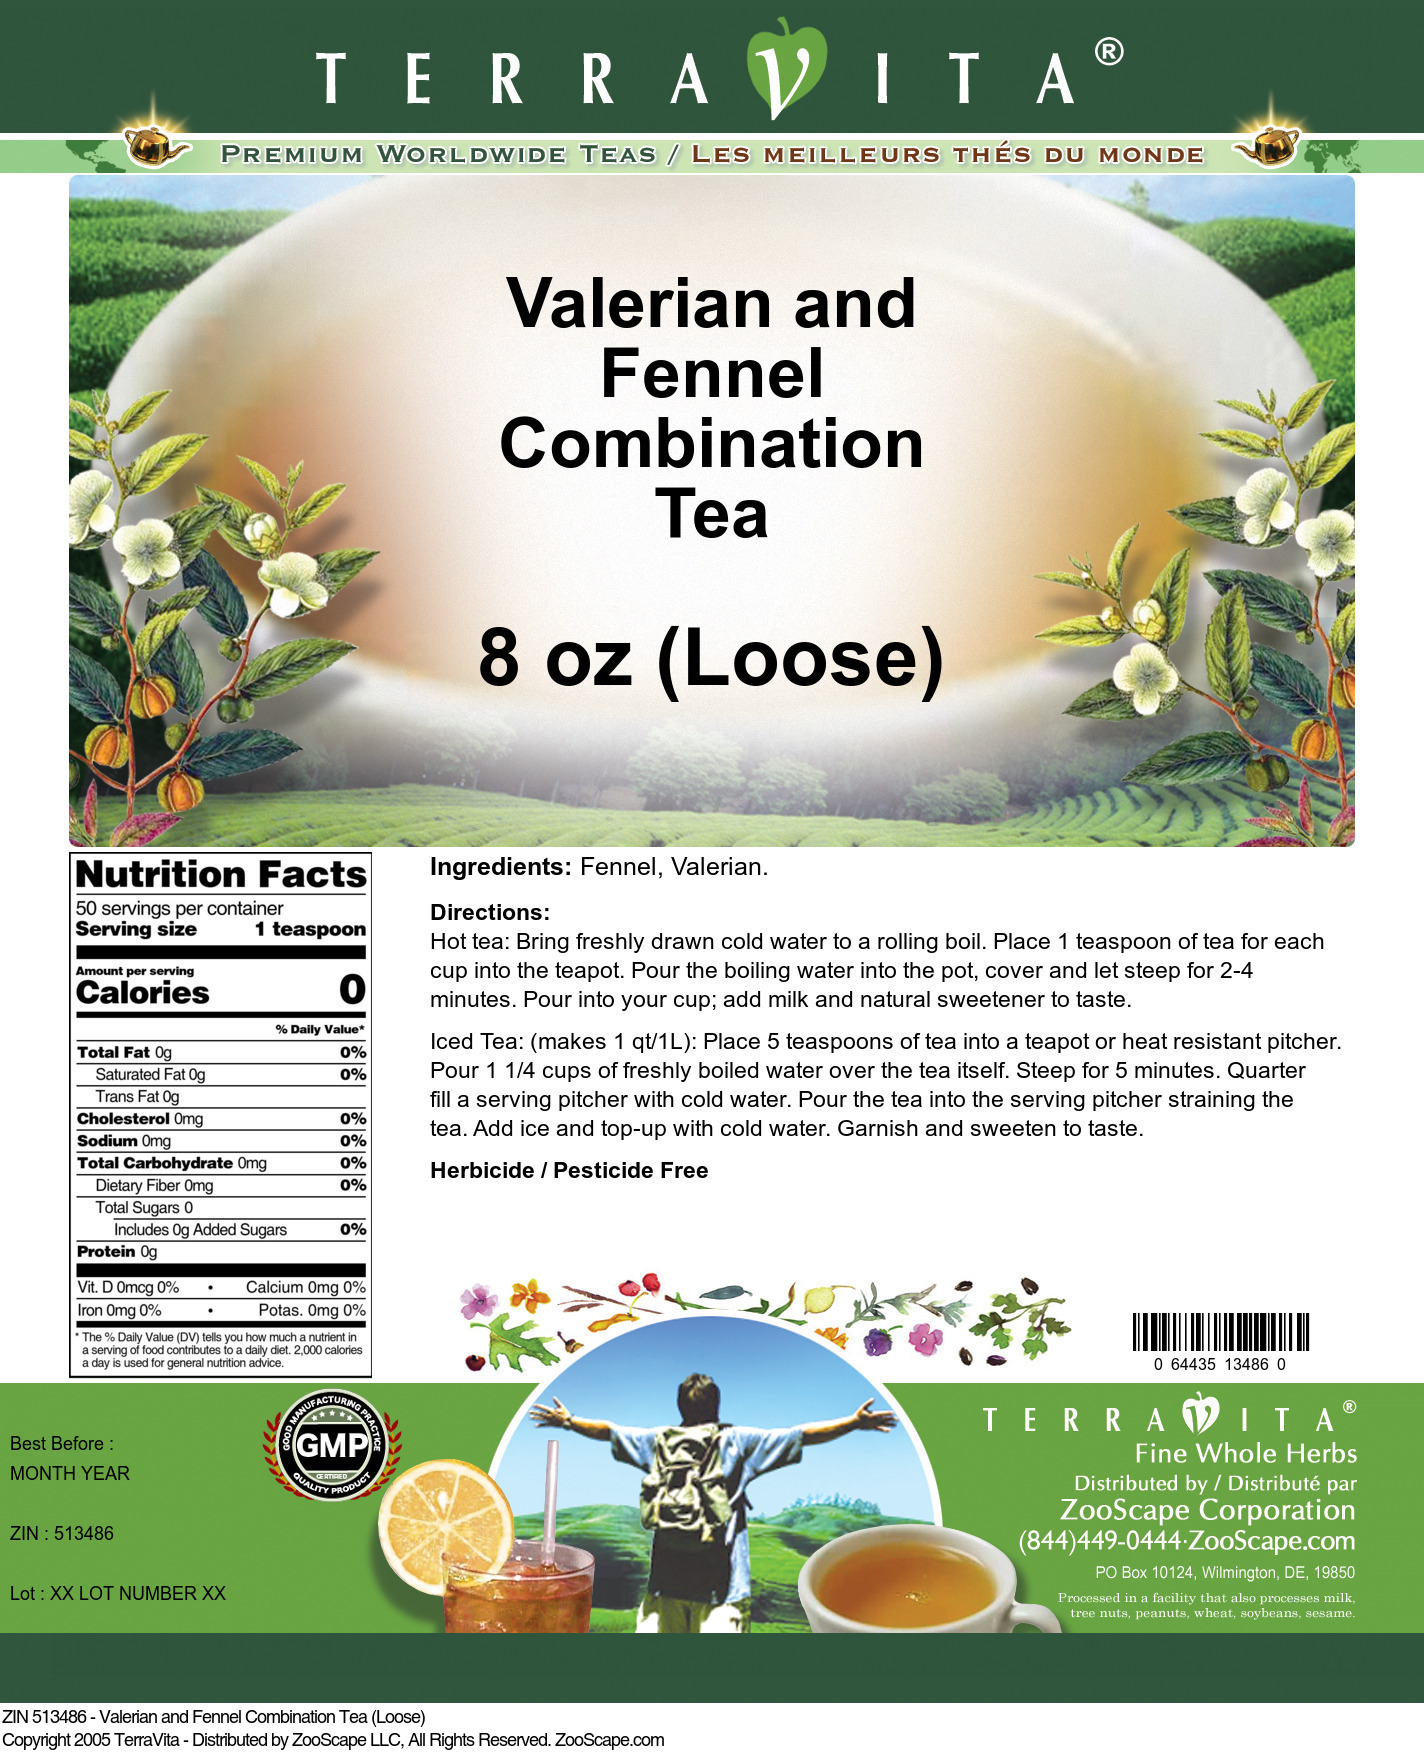 Valerian and Fennel Combination Tea (Loose)